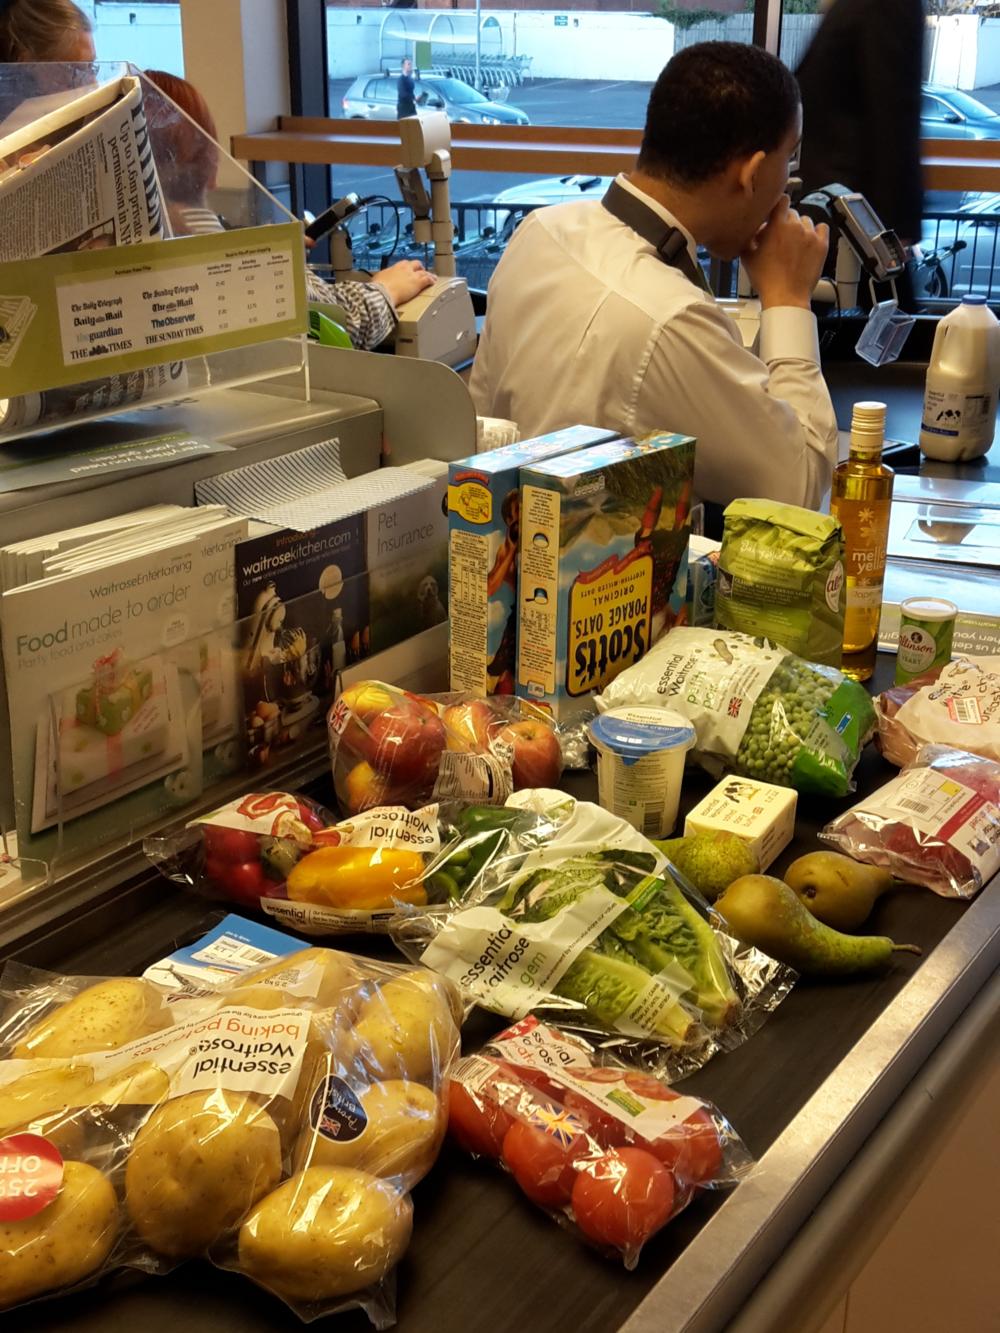 British staples in the supermarket